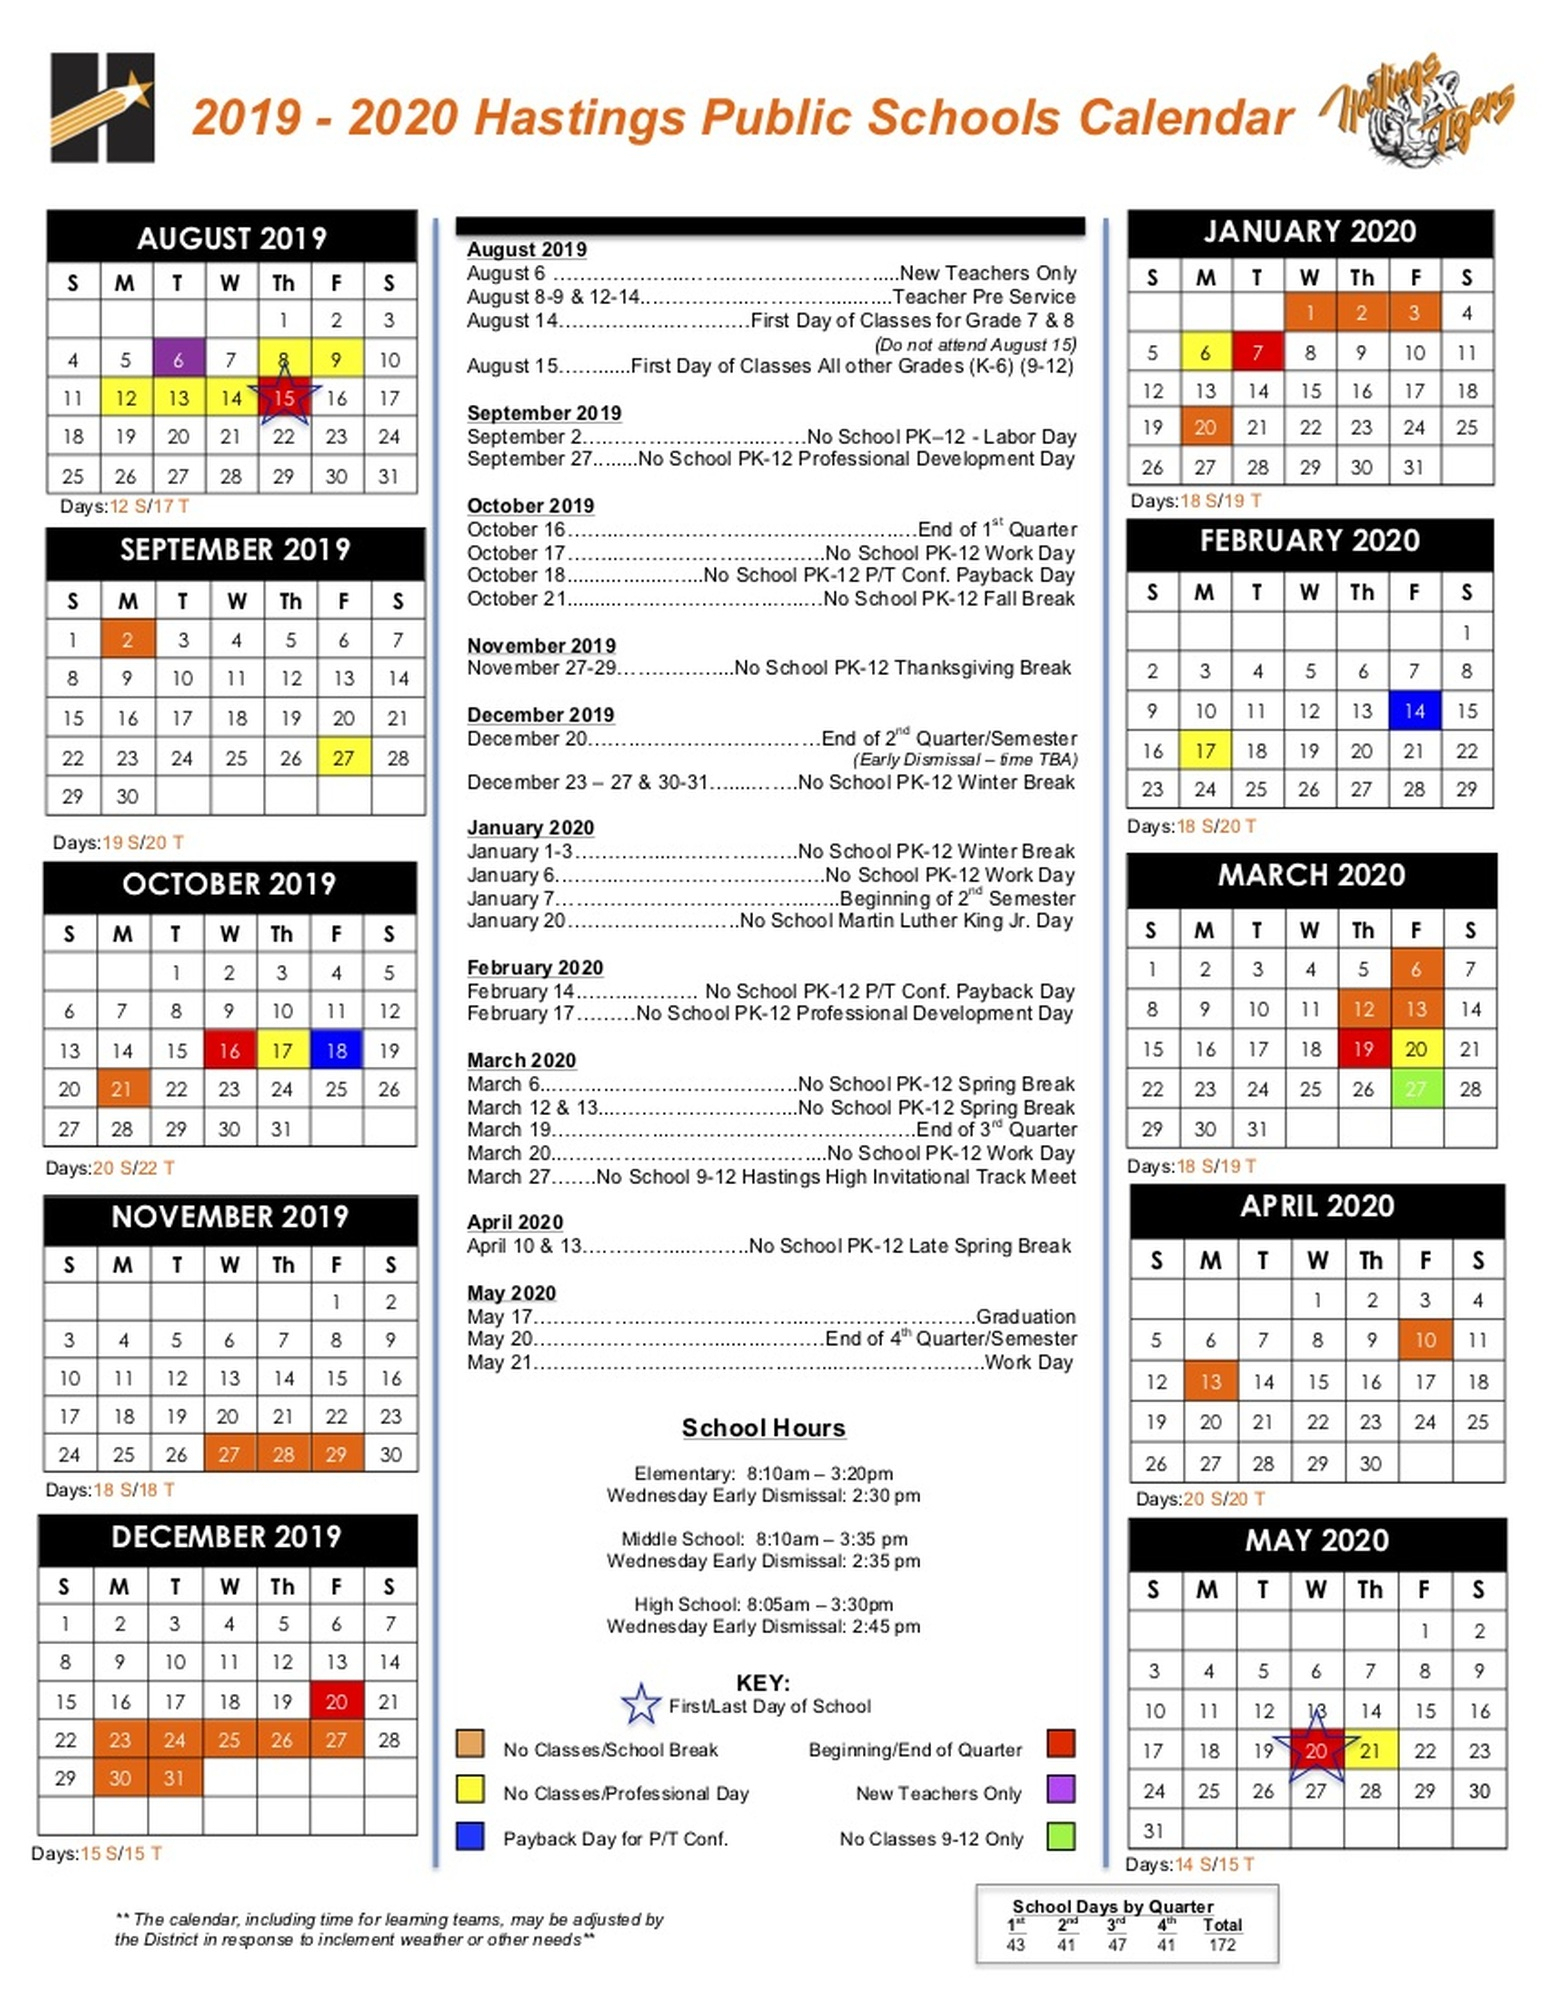 Days Of Attendance Calendar - Hastings Public Schools